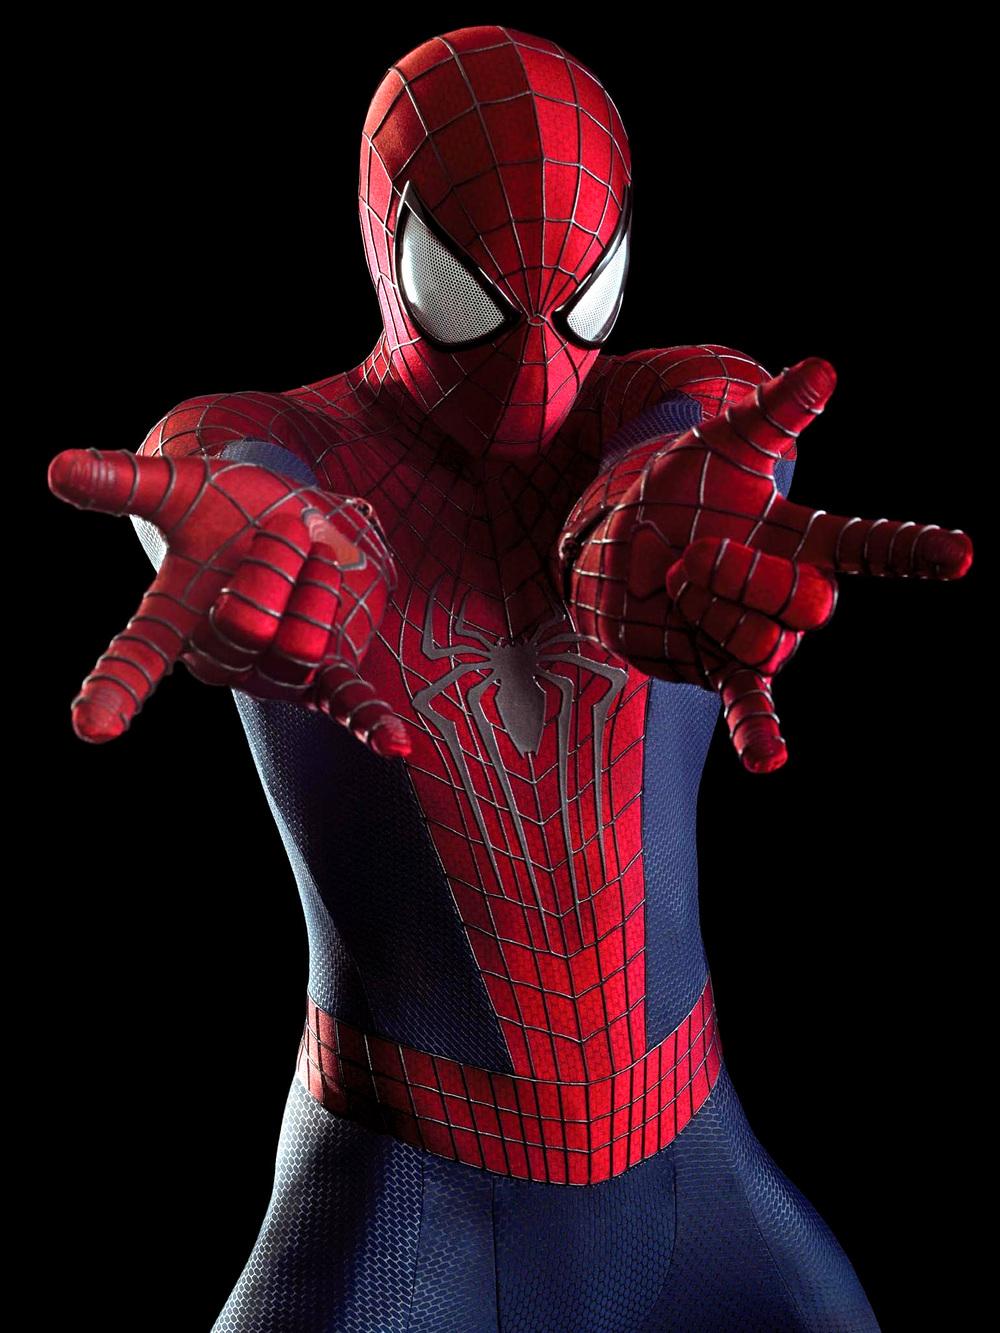 Image - The-amazing-spider-man-2-new-details-on-spideys ... Andrew Garfield Wiki